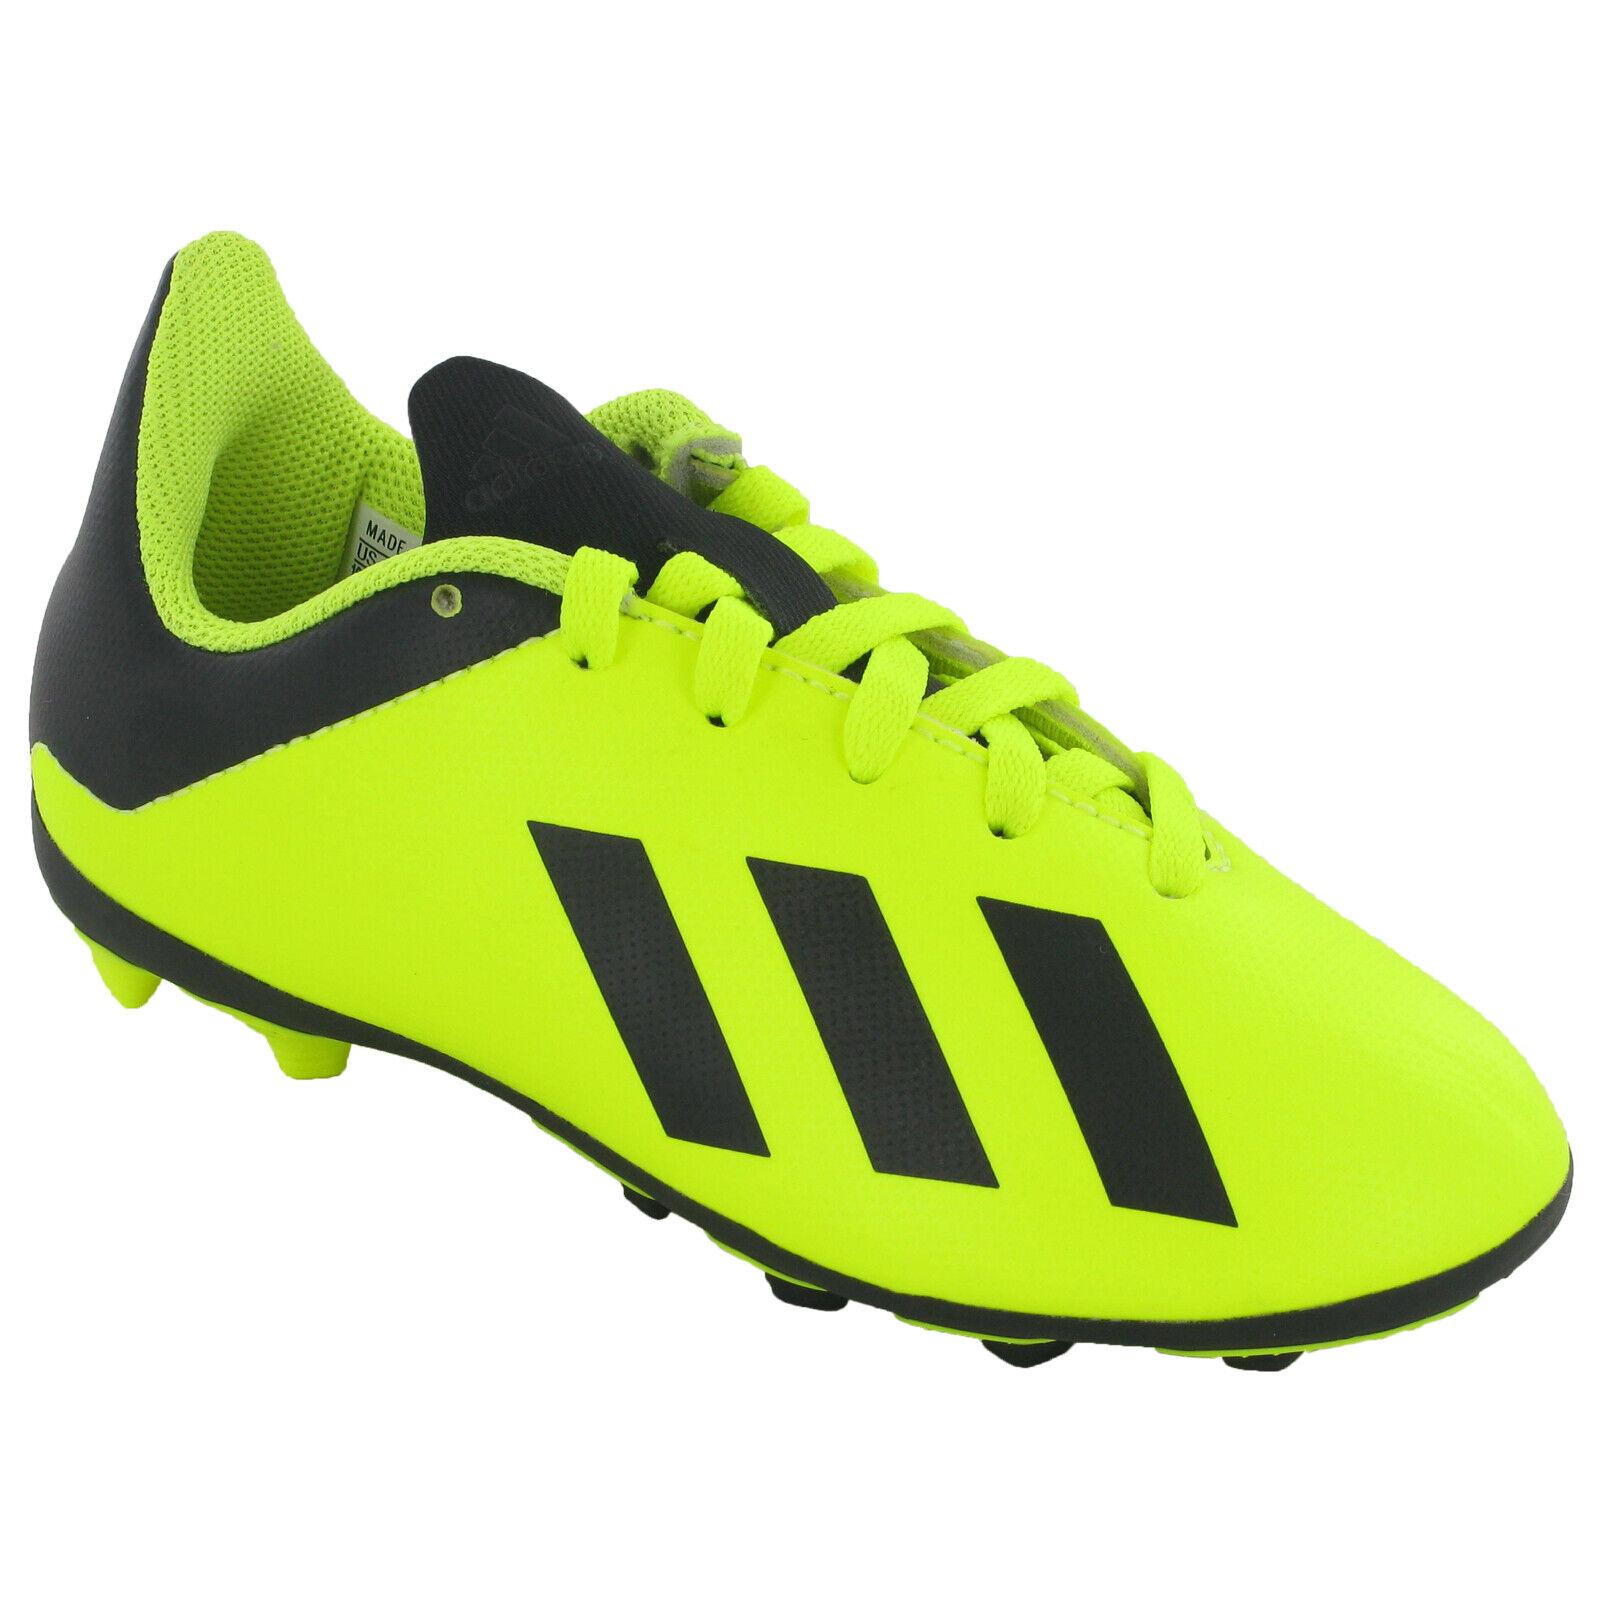 Adidas X18.4 FxG J Football Boots